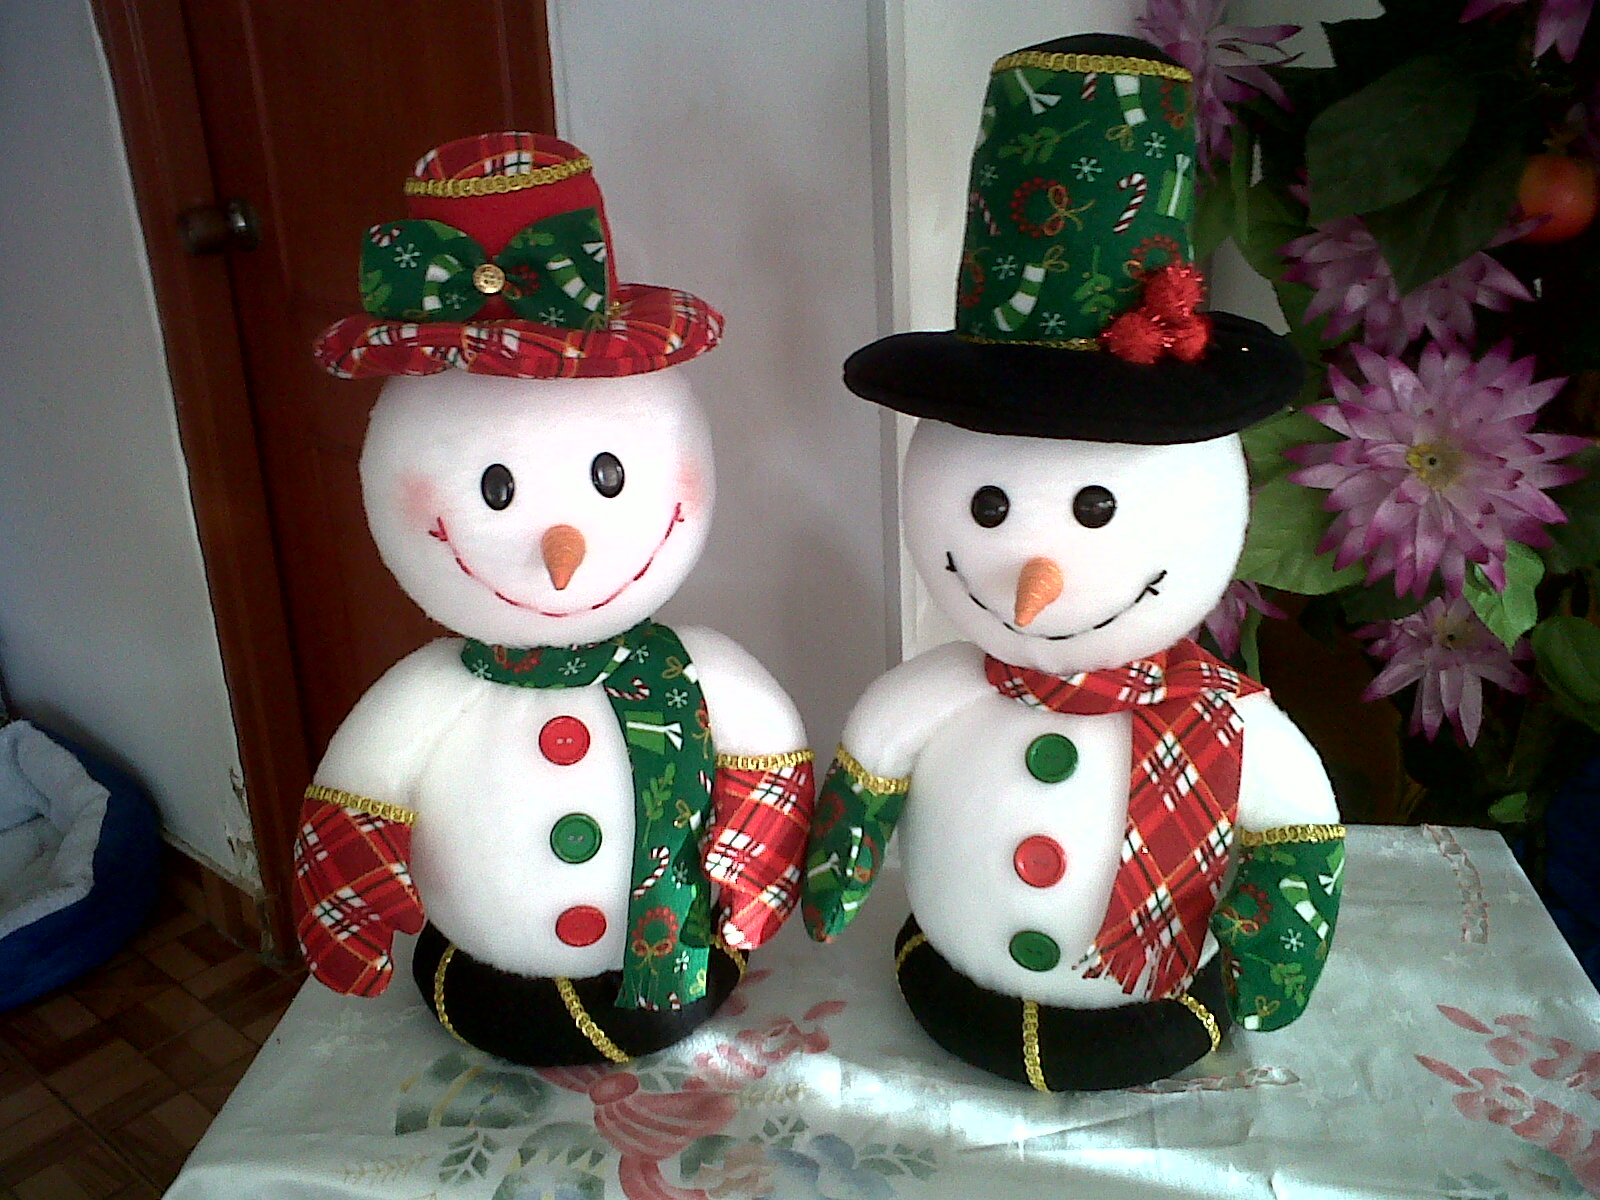 Nancy caballero sierra manualidades pao mu ecos de nieve - Manualidades munecos de navidad ...